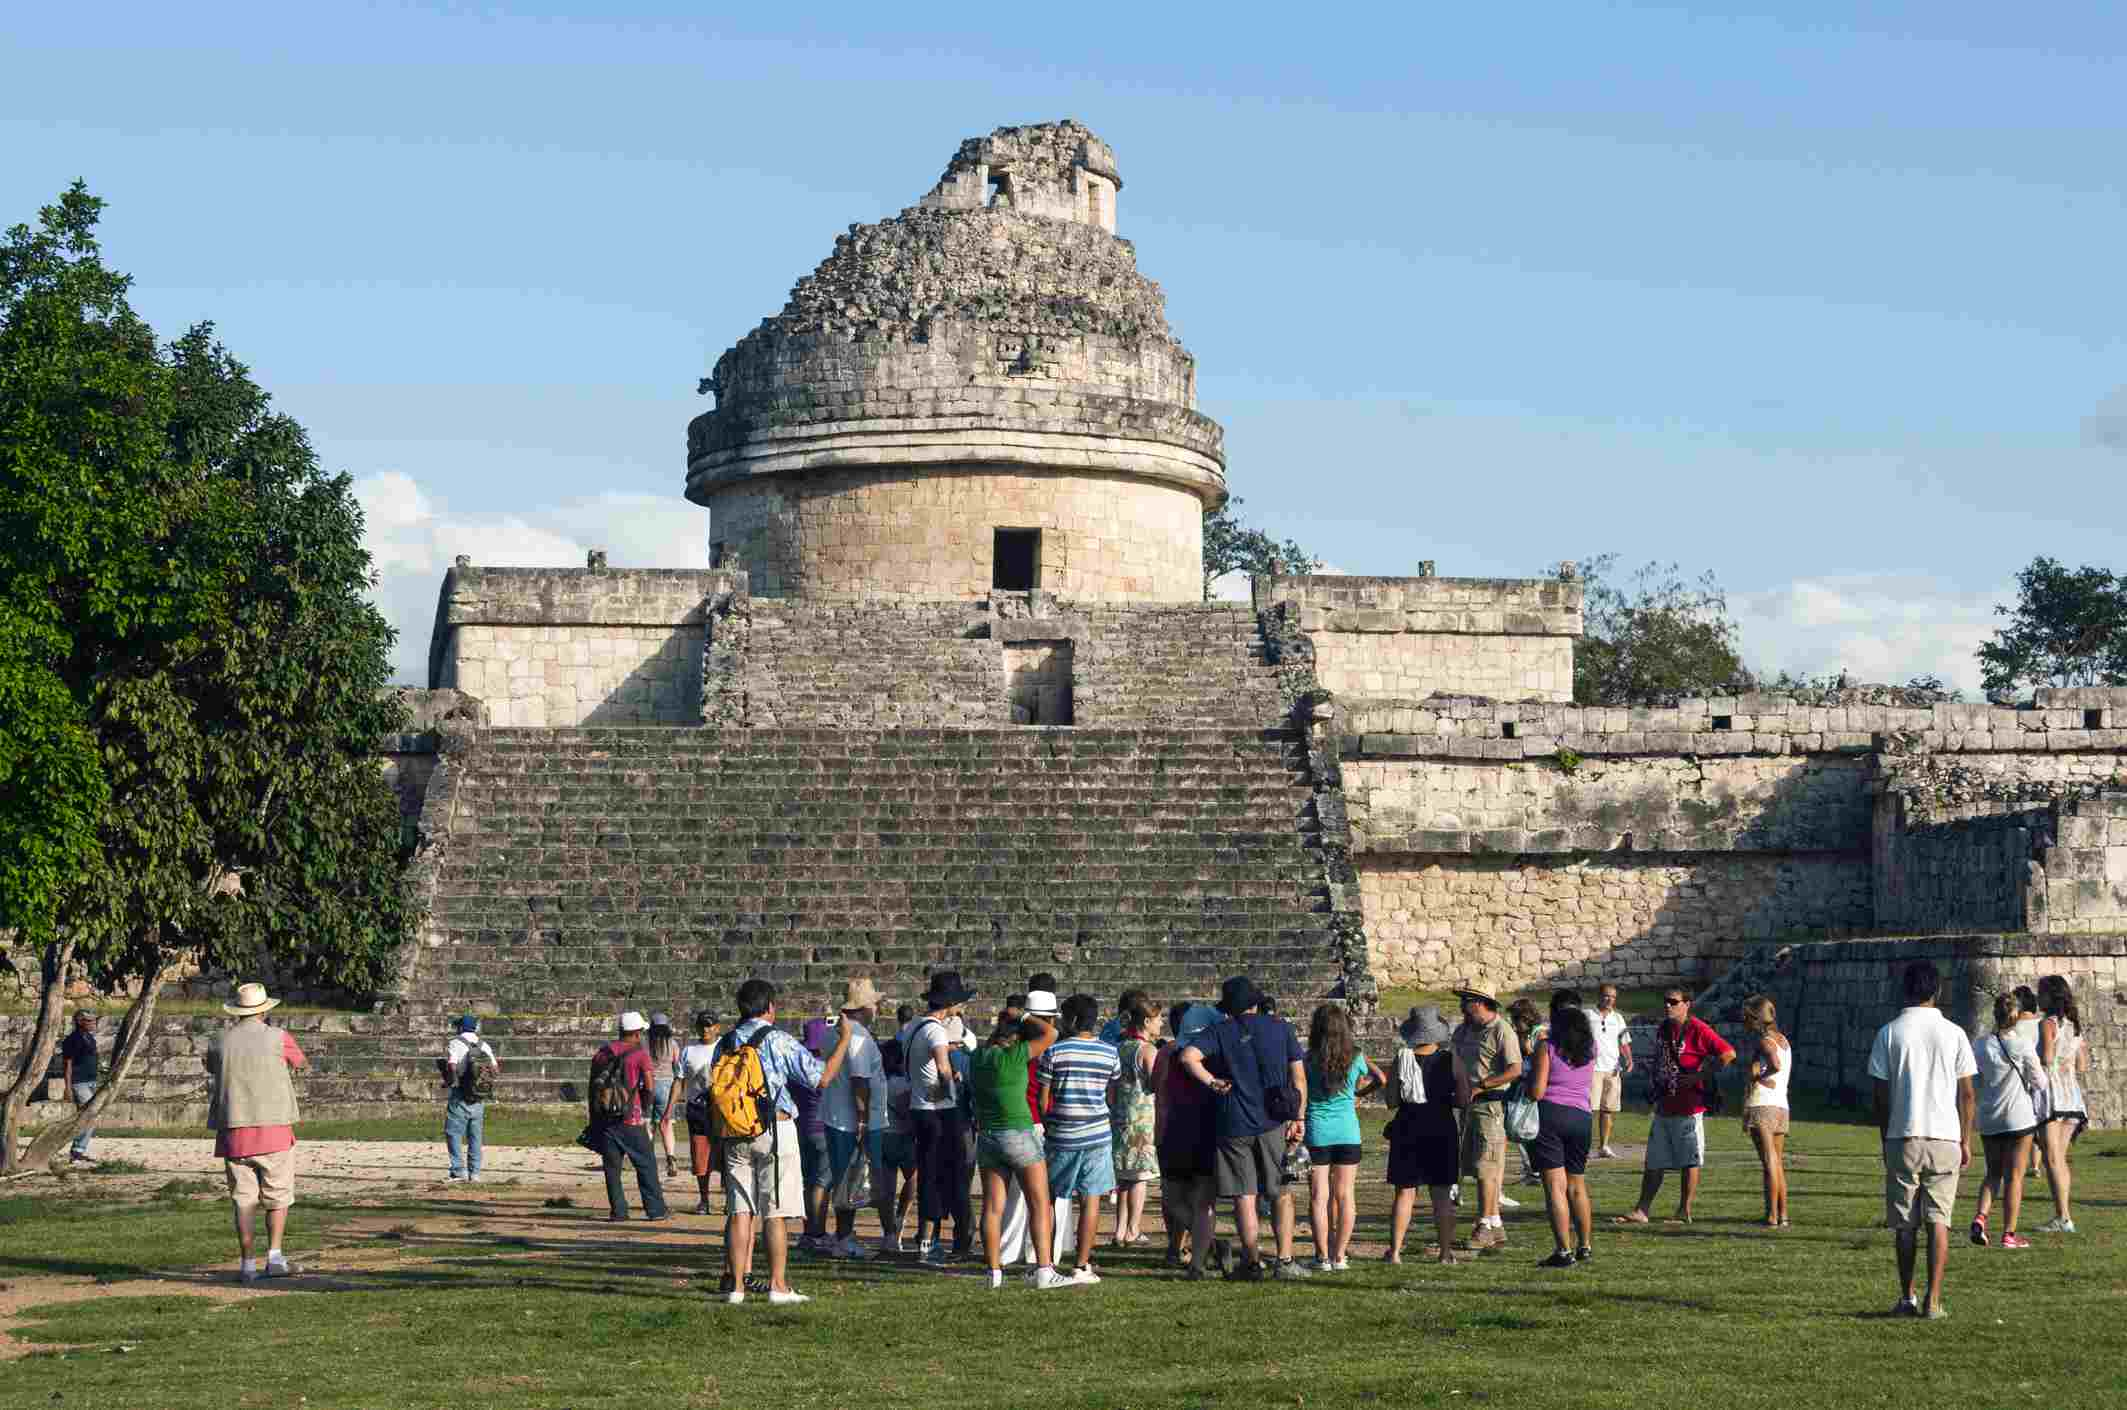 Tour group in Chichén Itzá